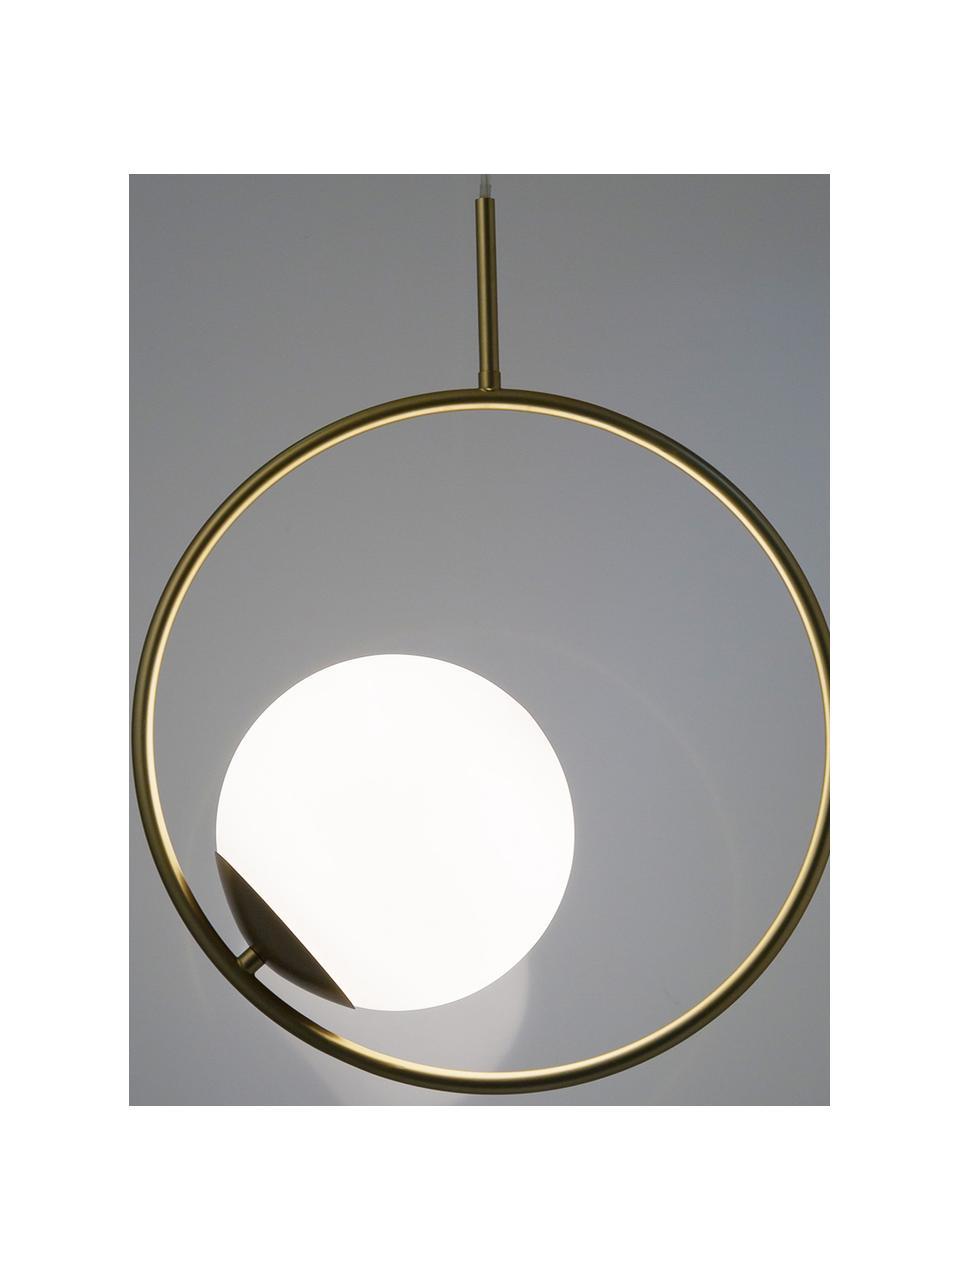 Suspension moderne dorée Chloe, Blanc, laiton